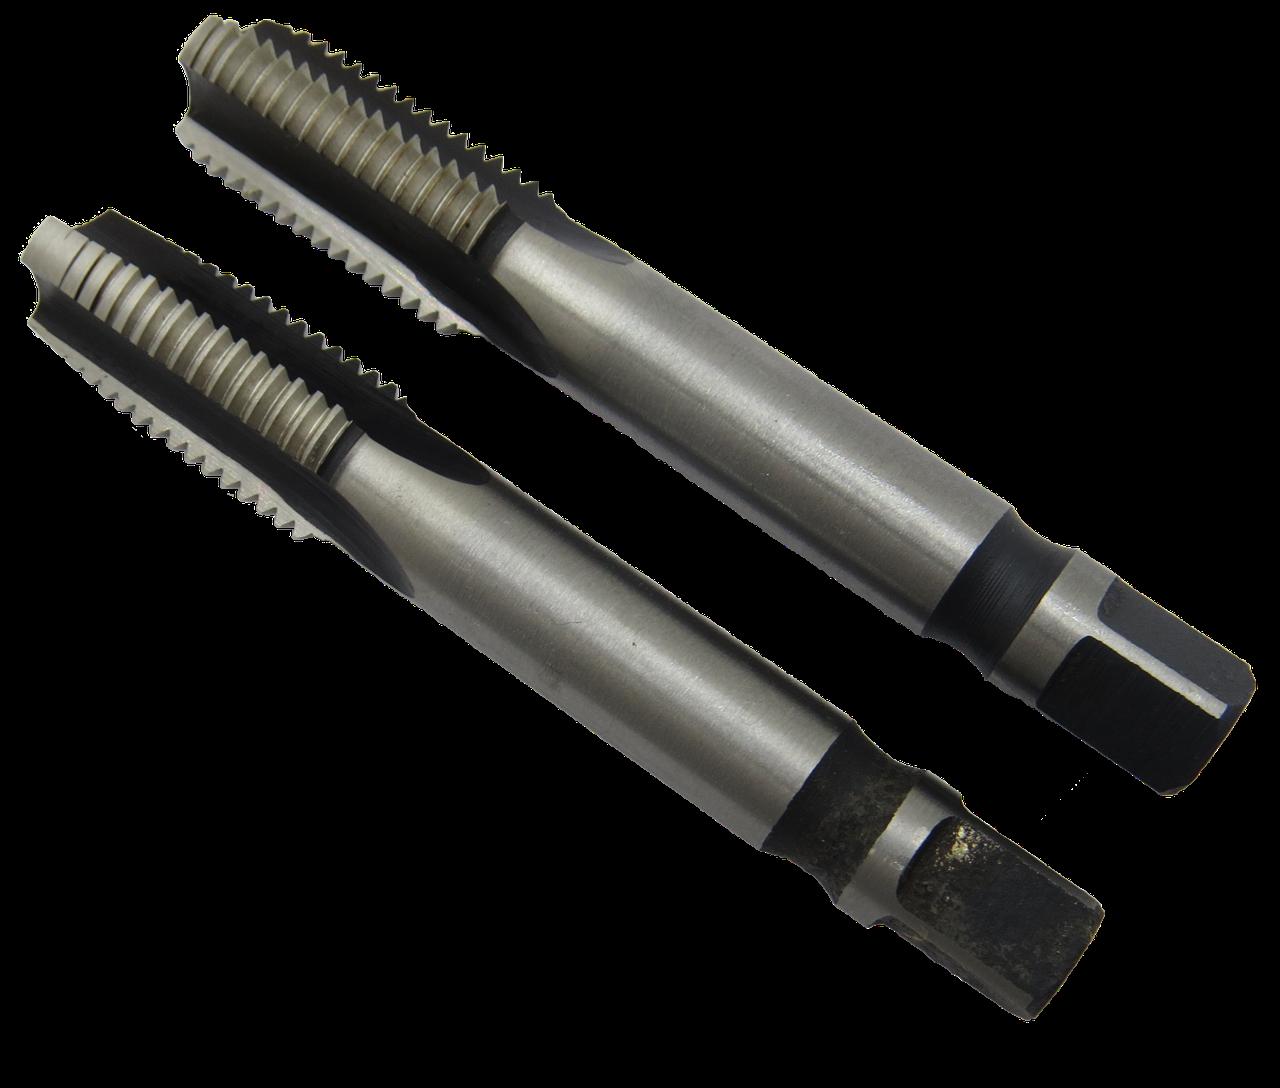 Метчик машинно-ручной М9х1,25 Р6М5 Н2 комплект из 2х штук